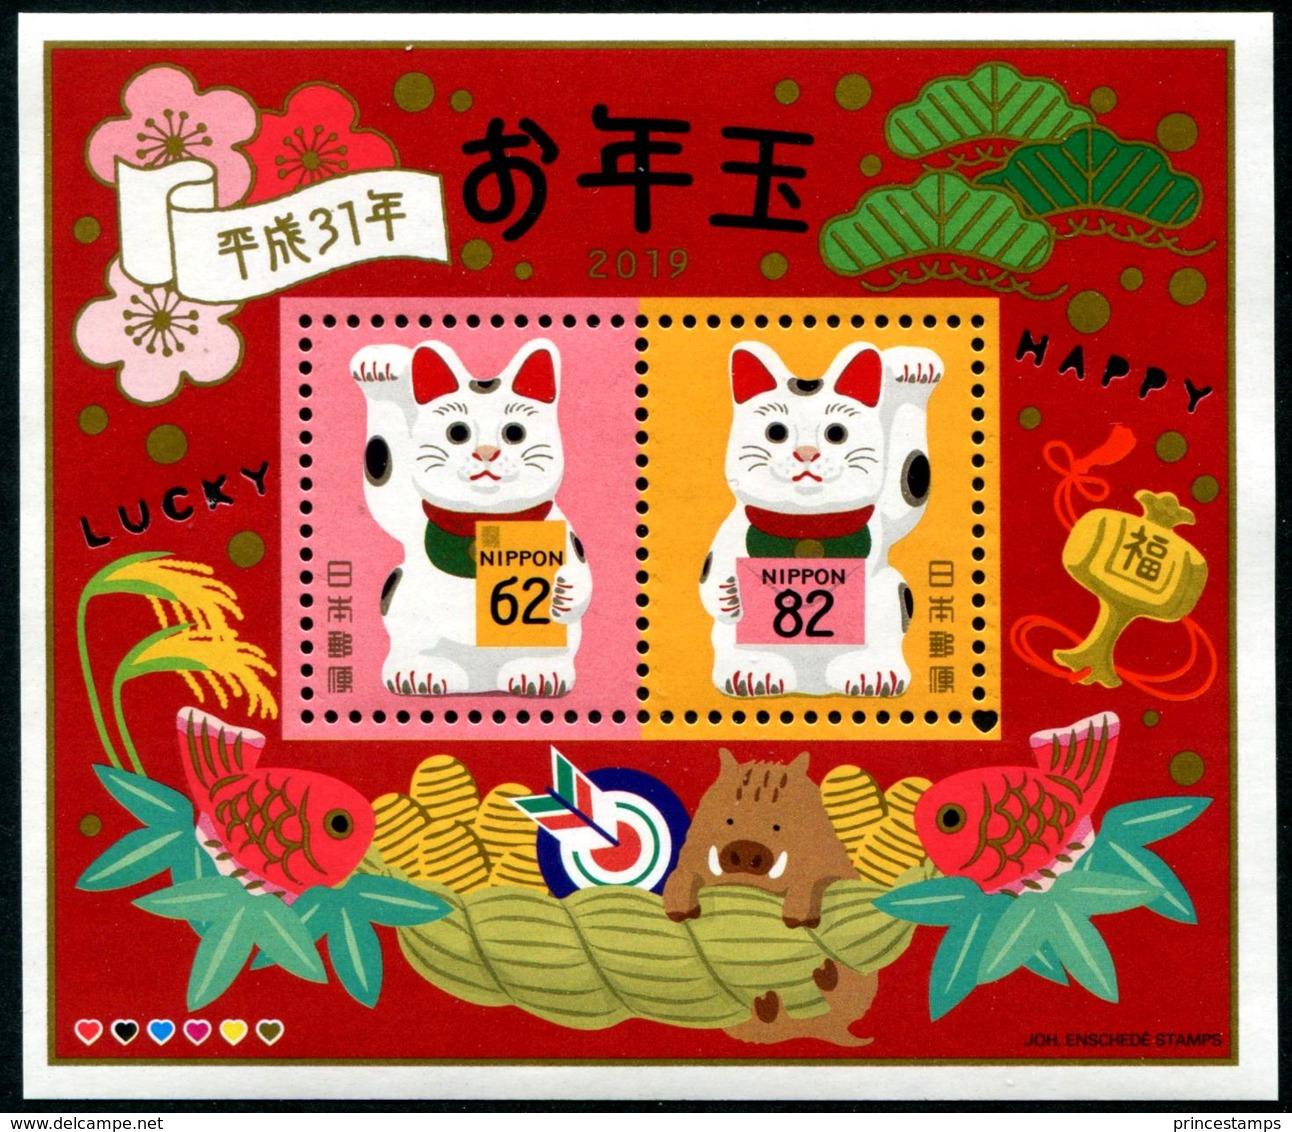 Japan (2019) - Block - / Lottery Chinese New Year - Chinees Nieuwjaar